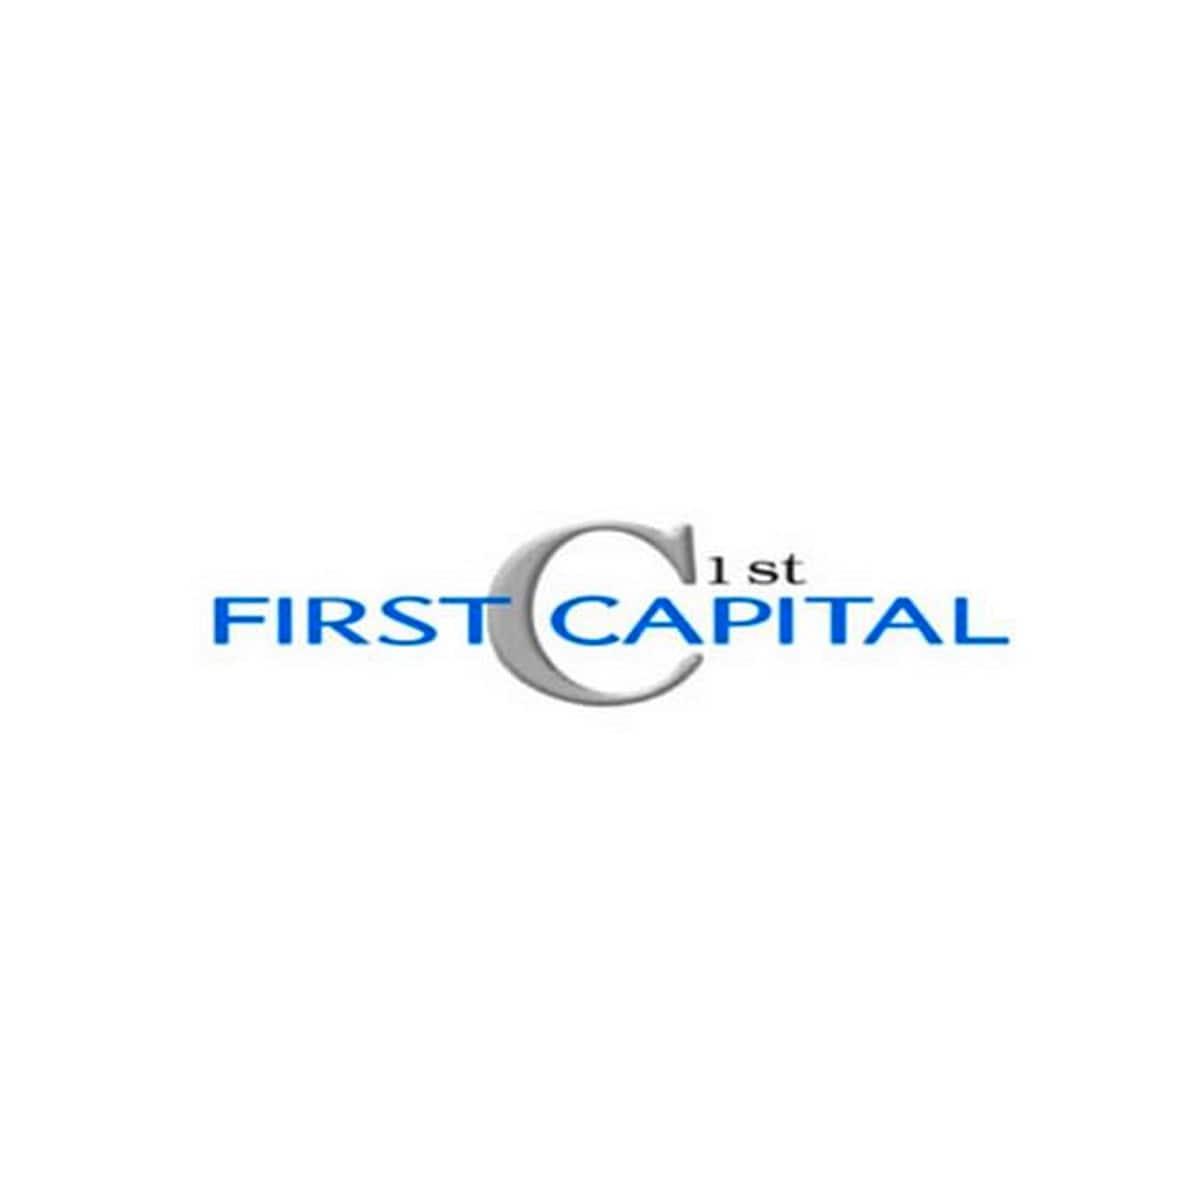 First Capital, NAV a 21,8 euro a fine dicembre 2020